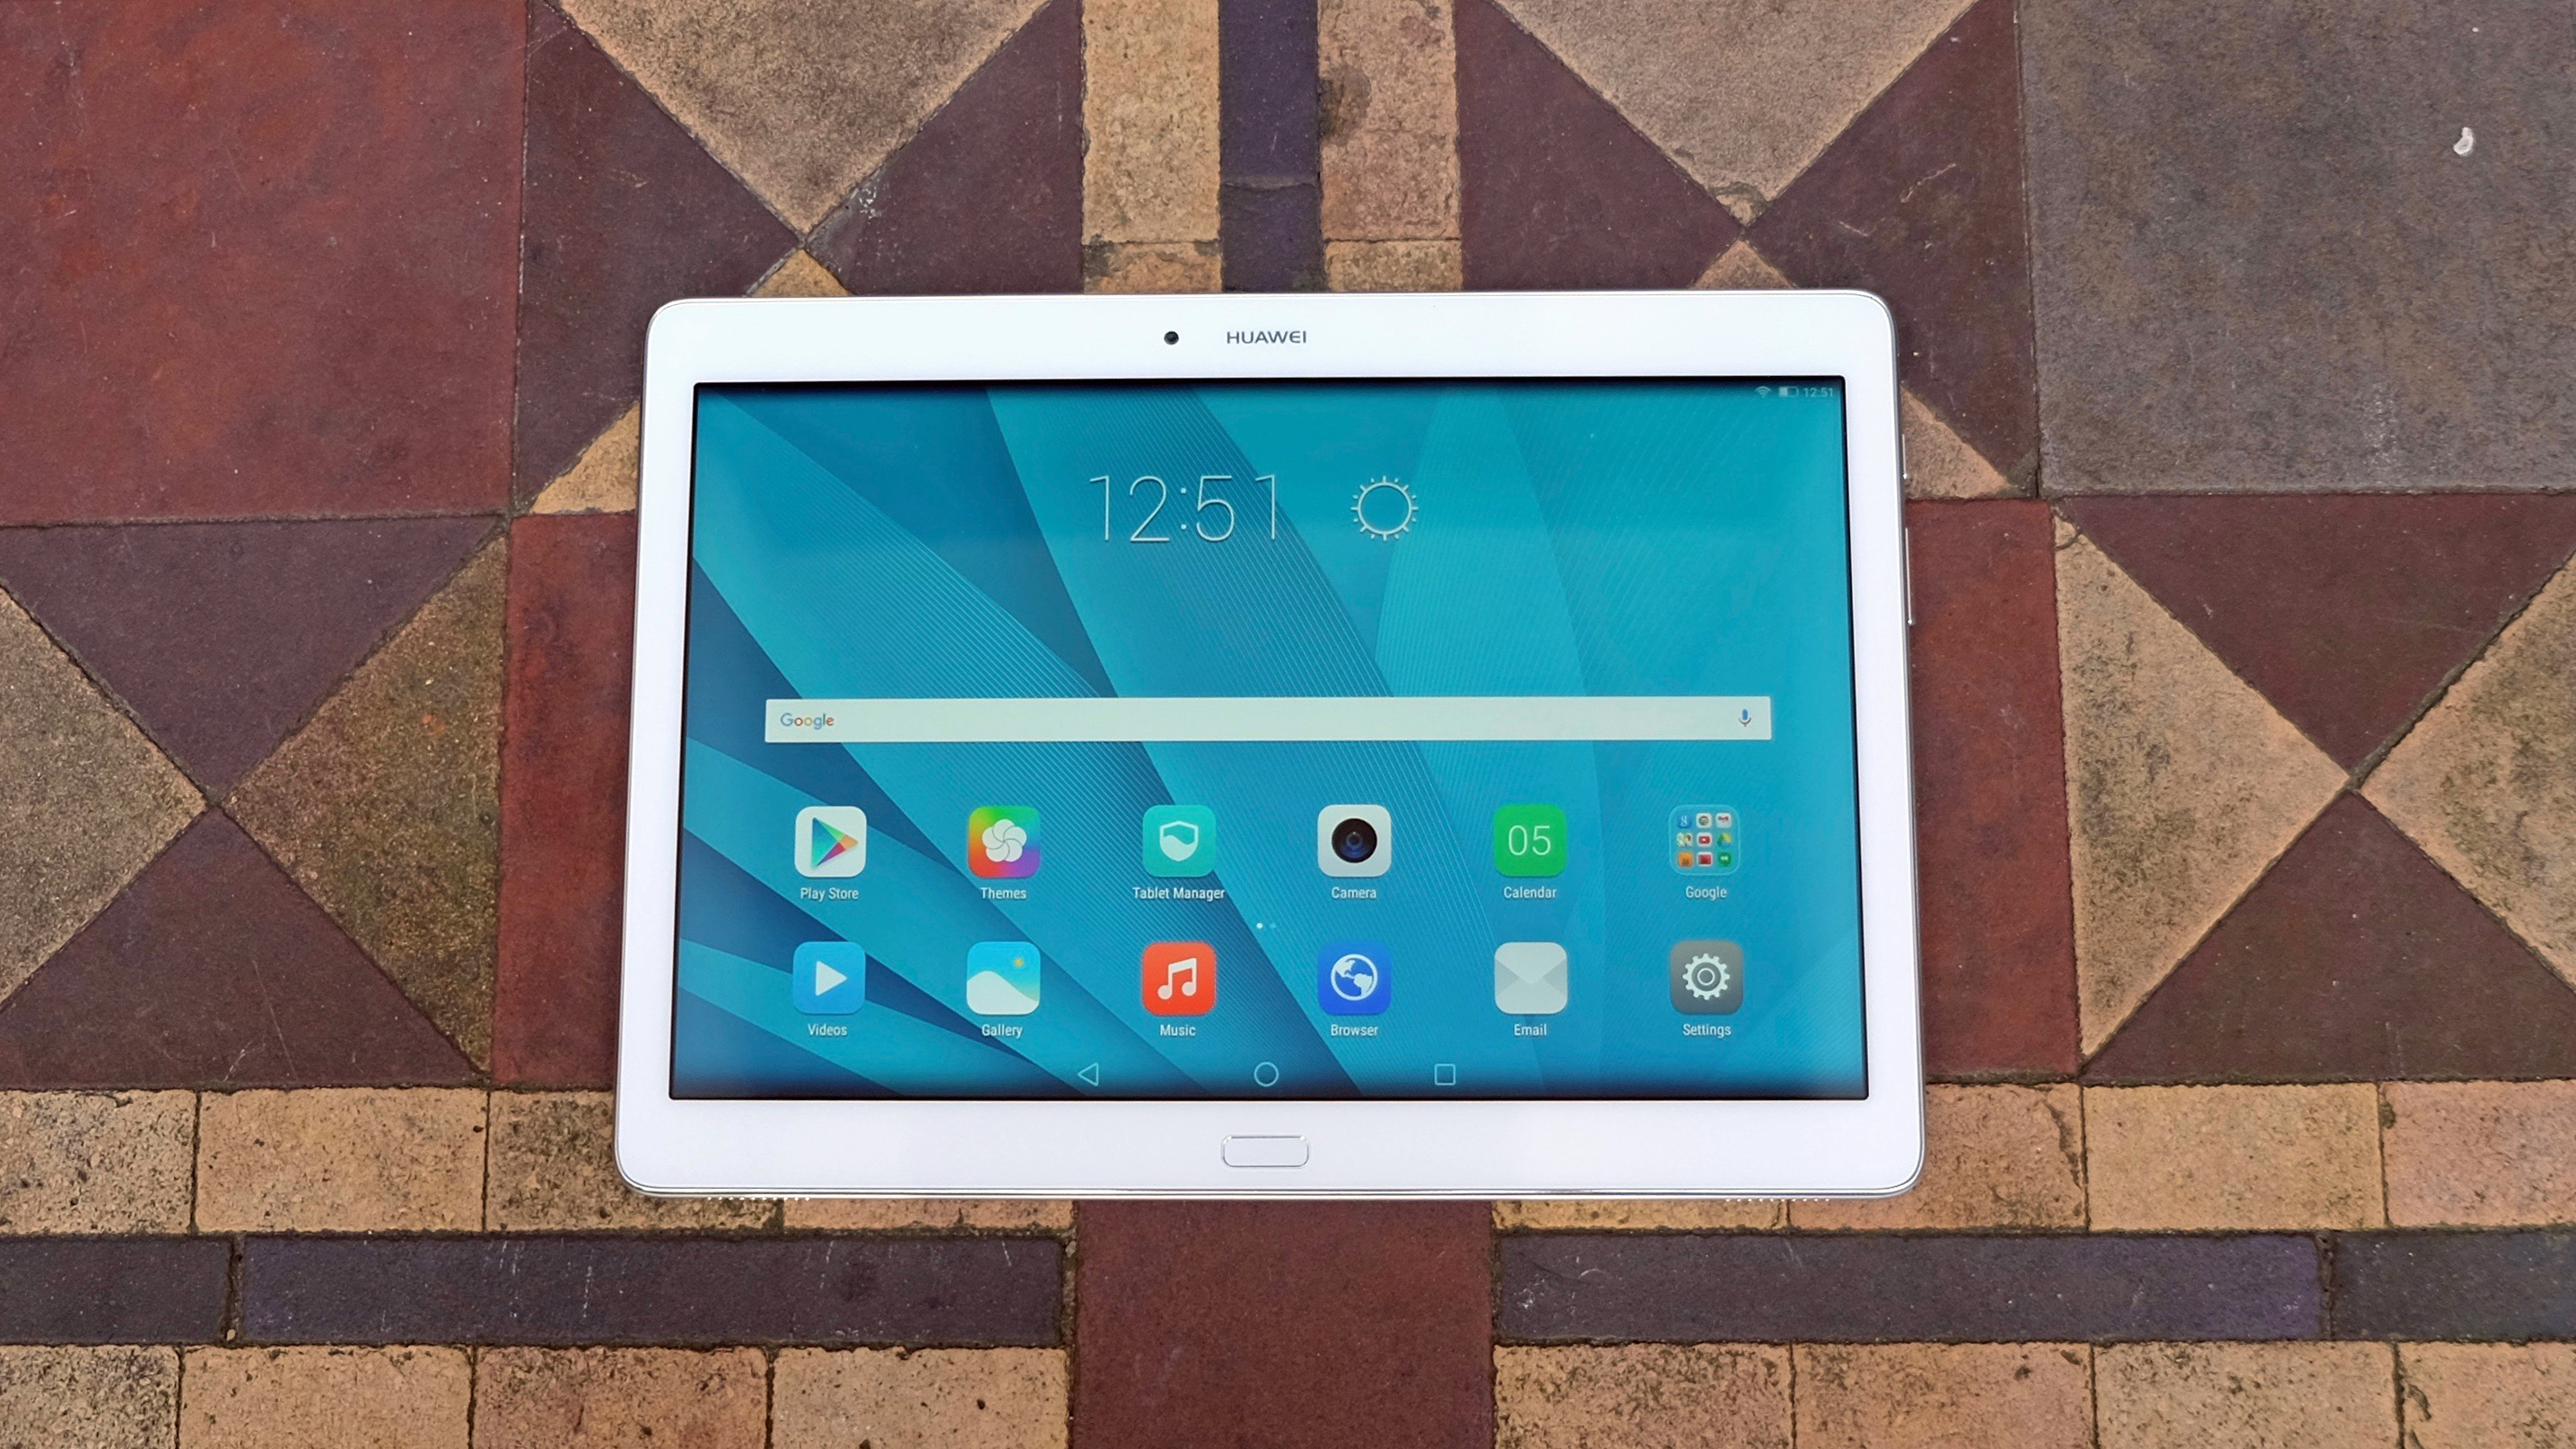 Huawei MediaPad M2 10 0 review | TechRadar